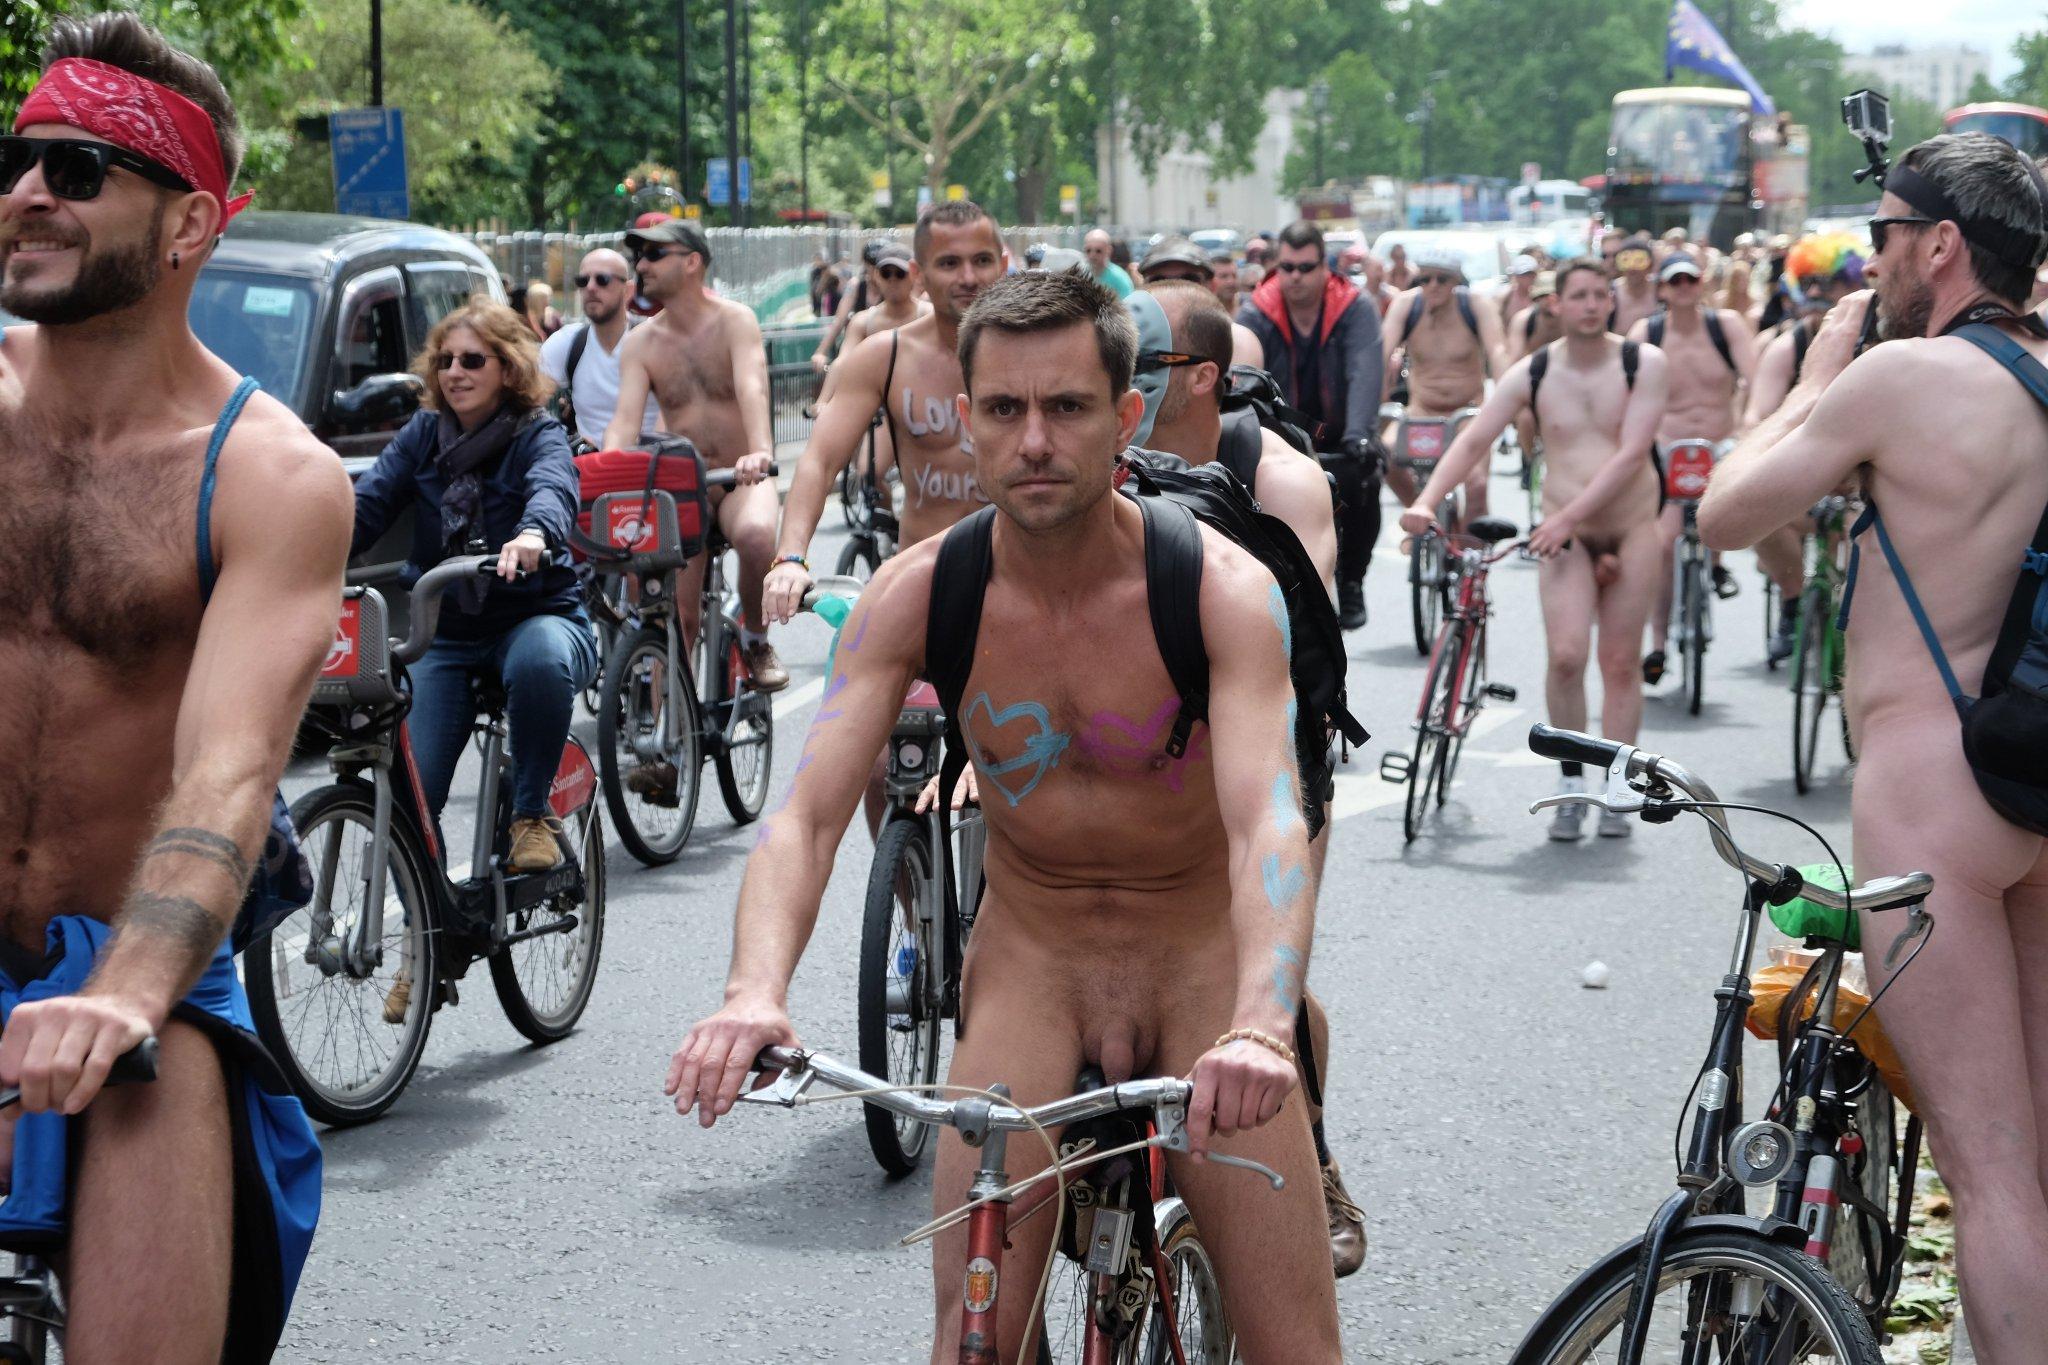 Public male nudity vids #14